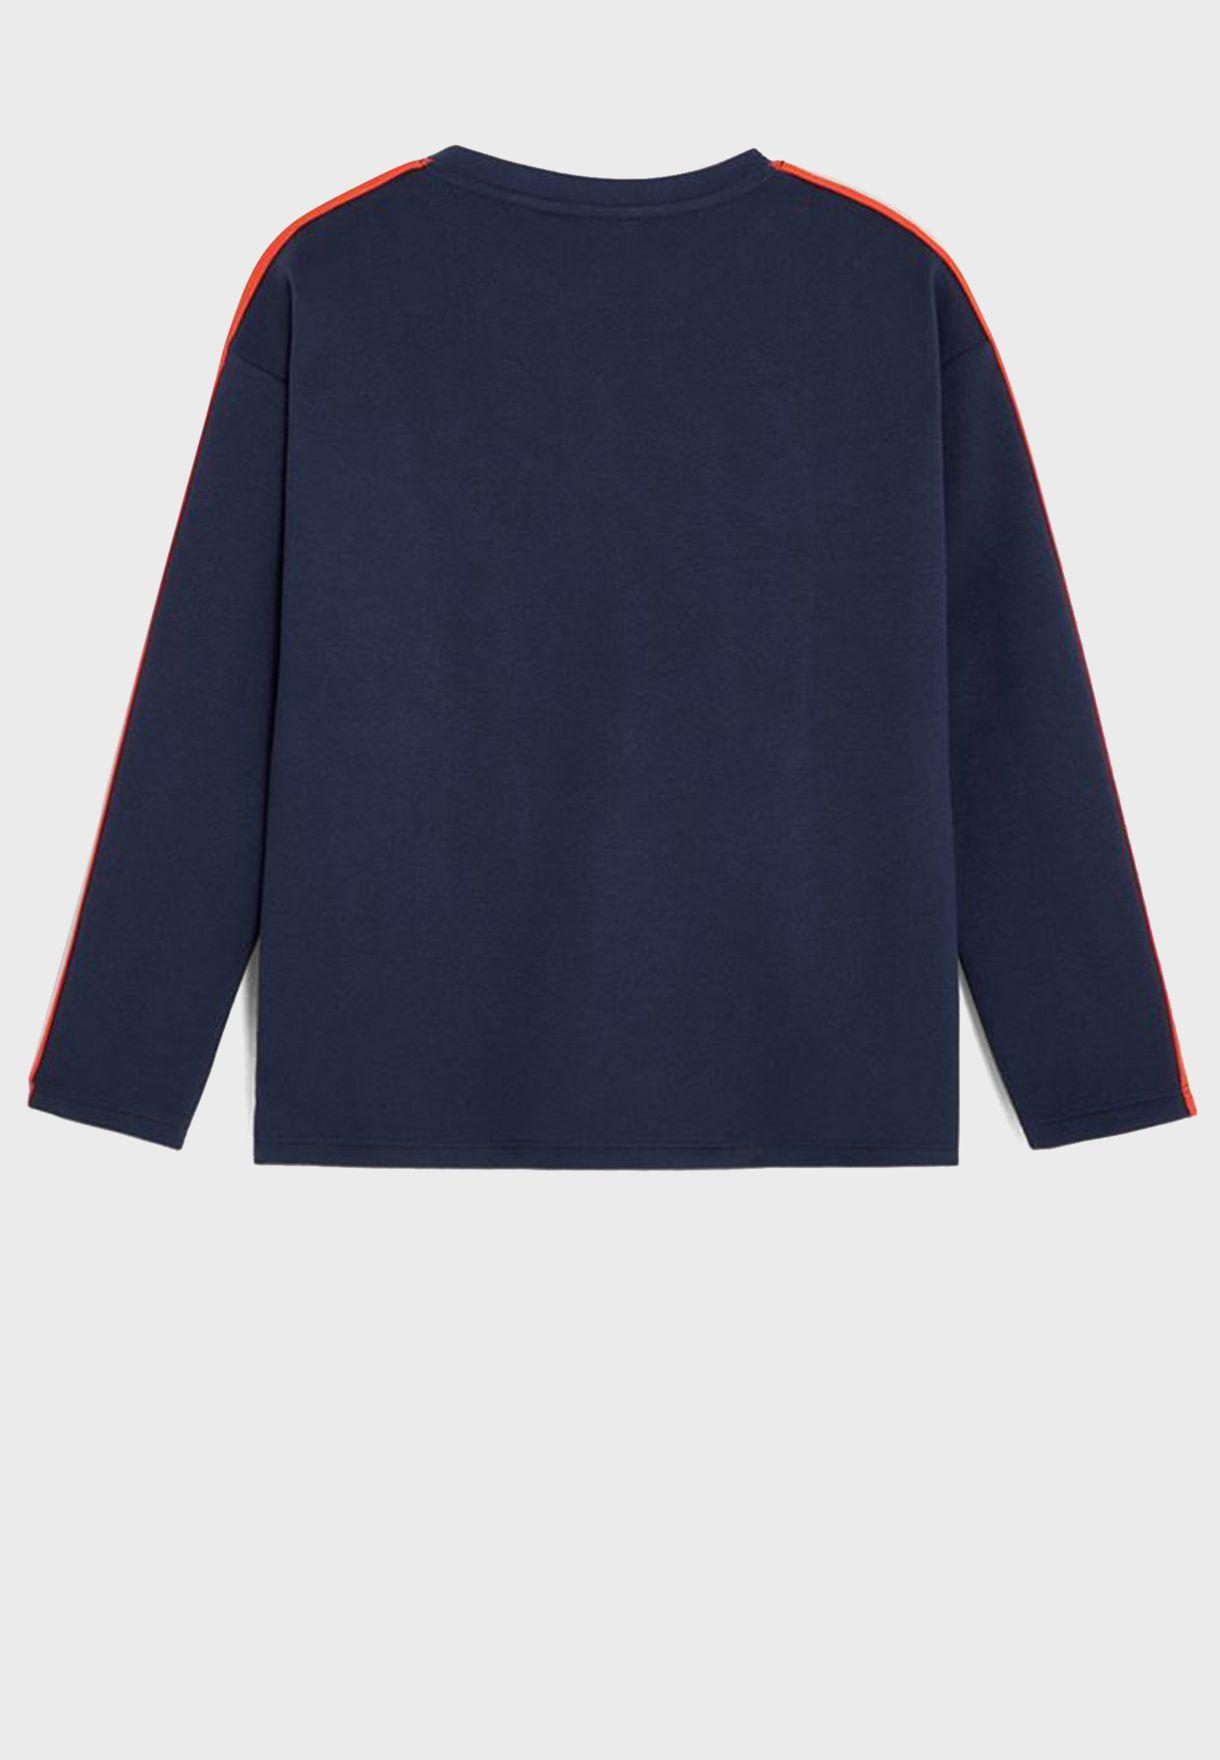 Youth Graphic Sweatshirt